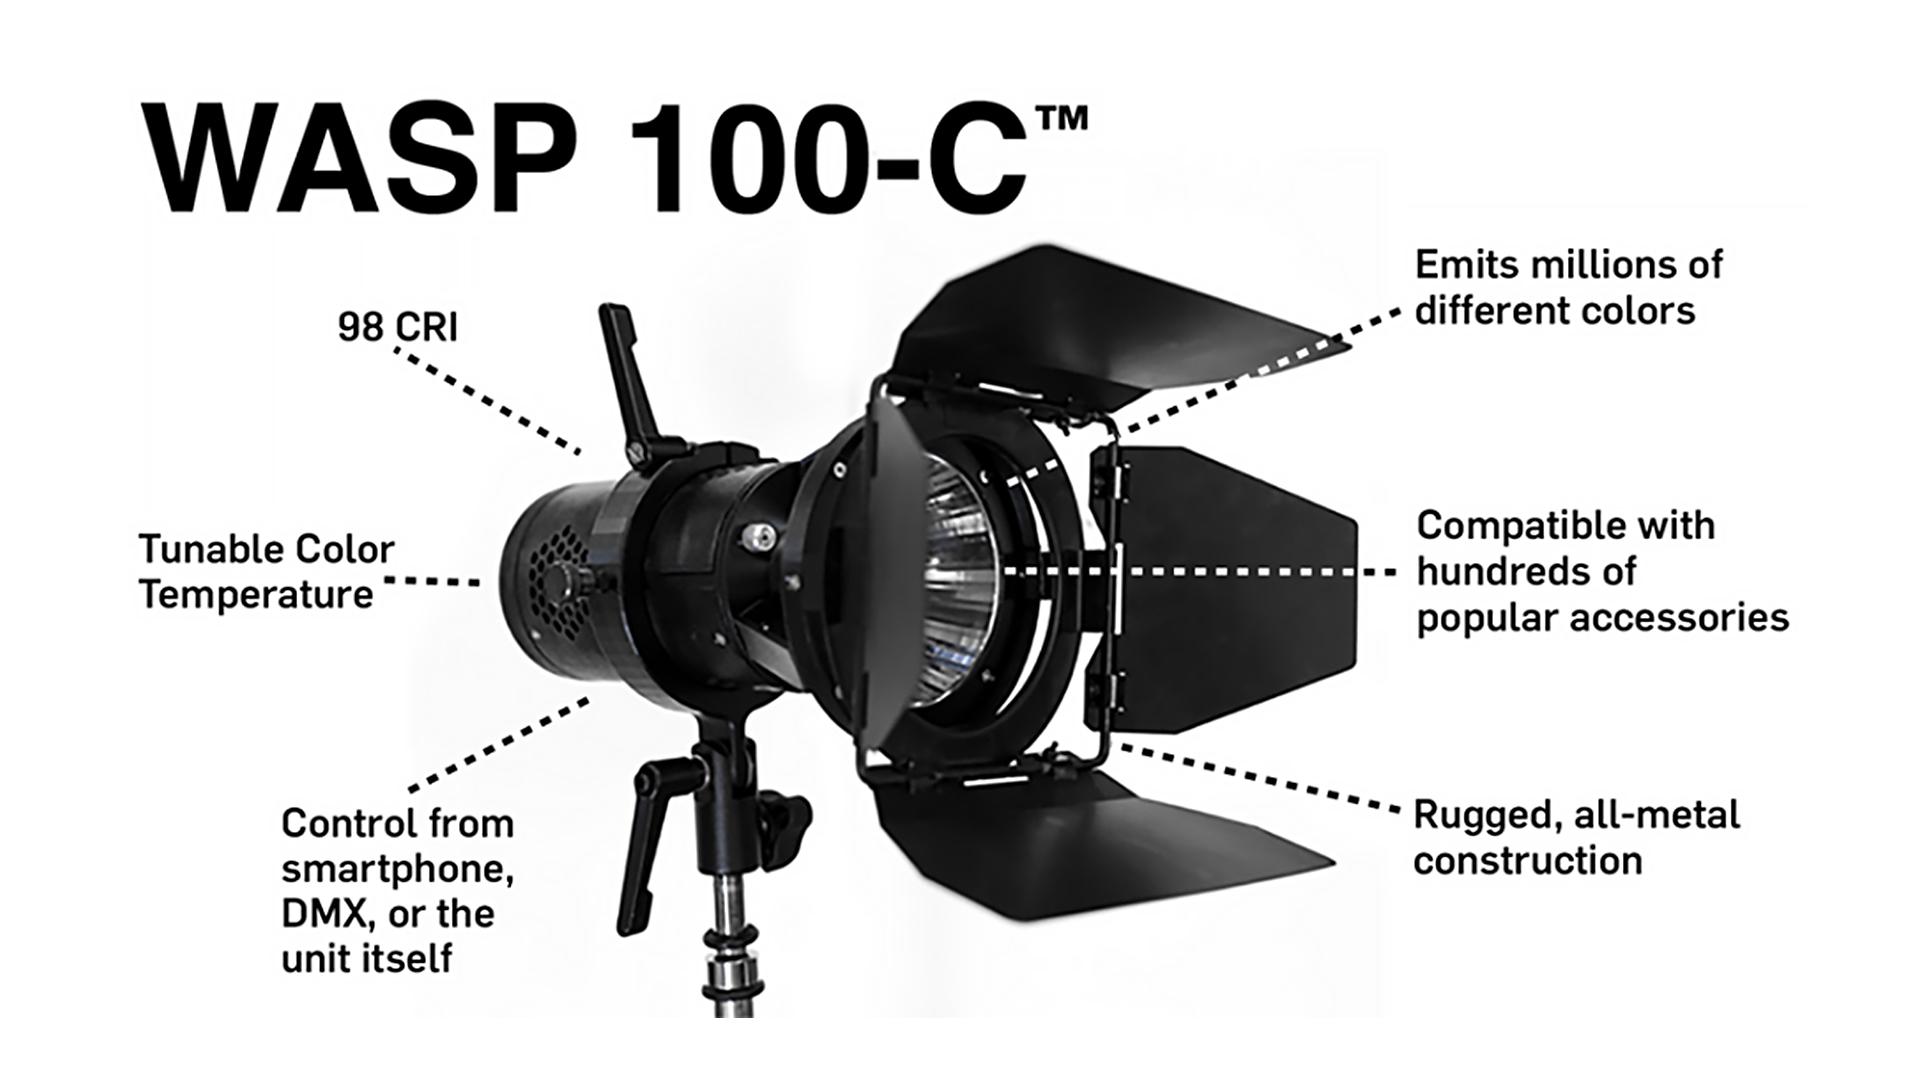 Hive WASP 100-Cがキックスターターに登場 - 100W LED Omni Colorライト